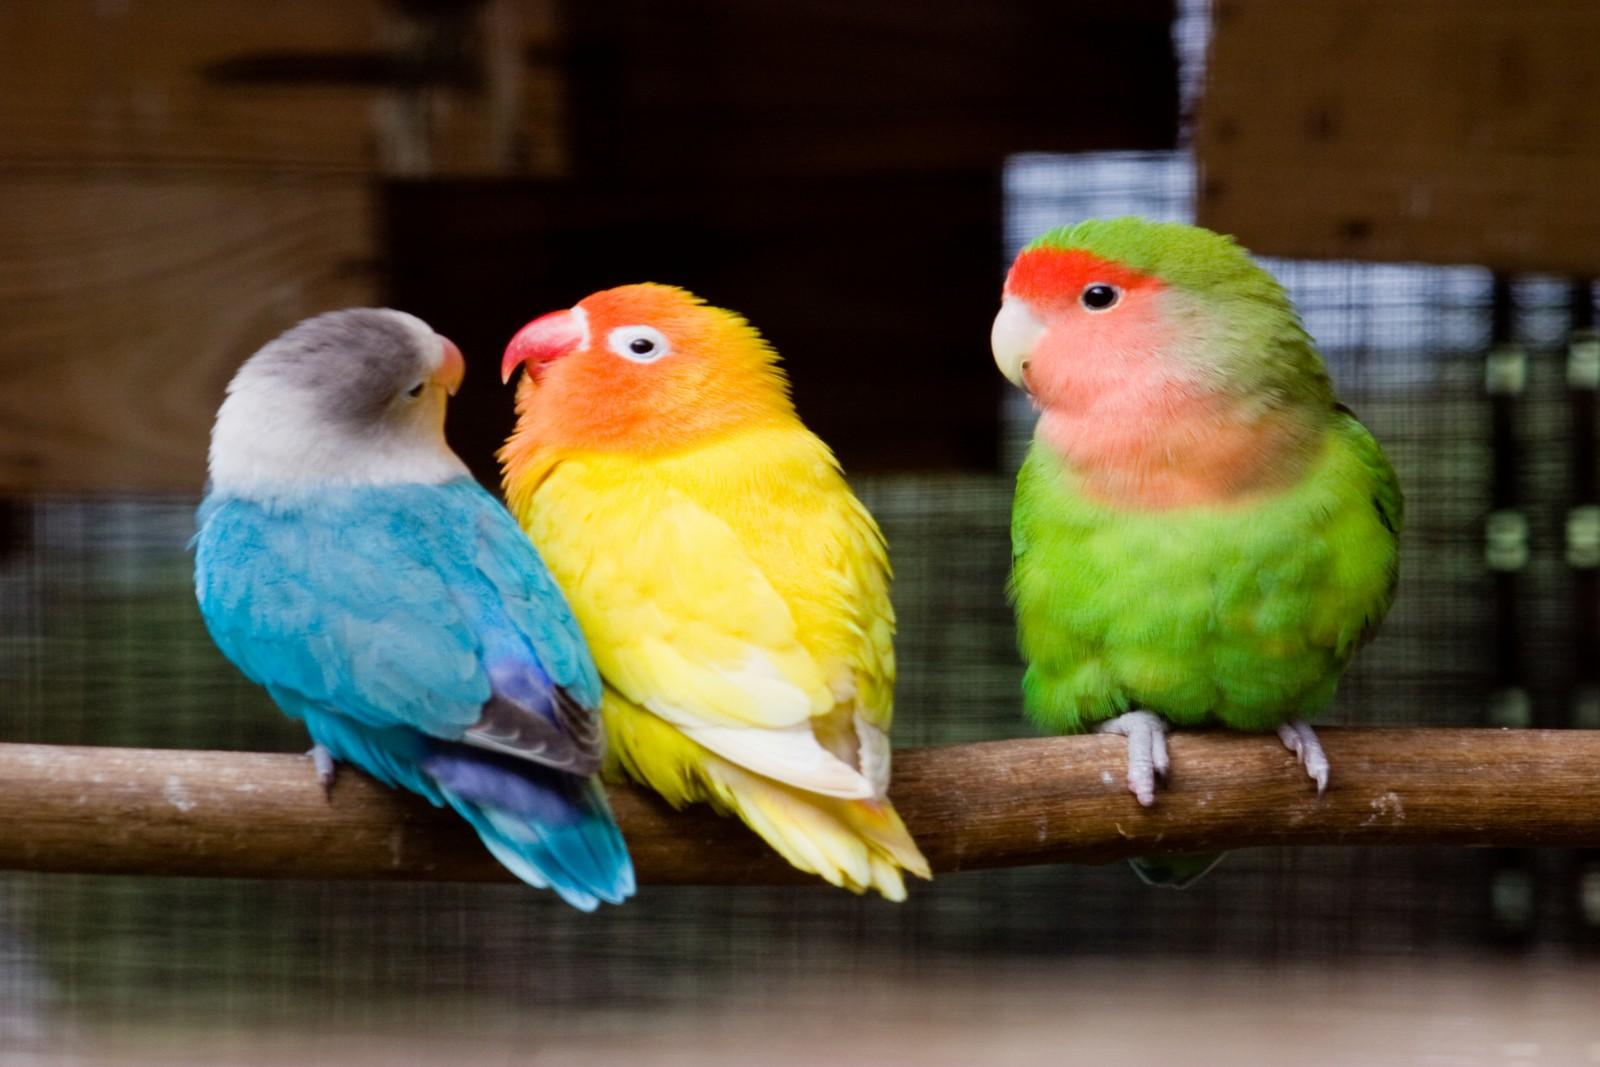 A jealous bird.